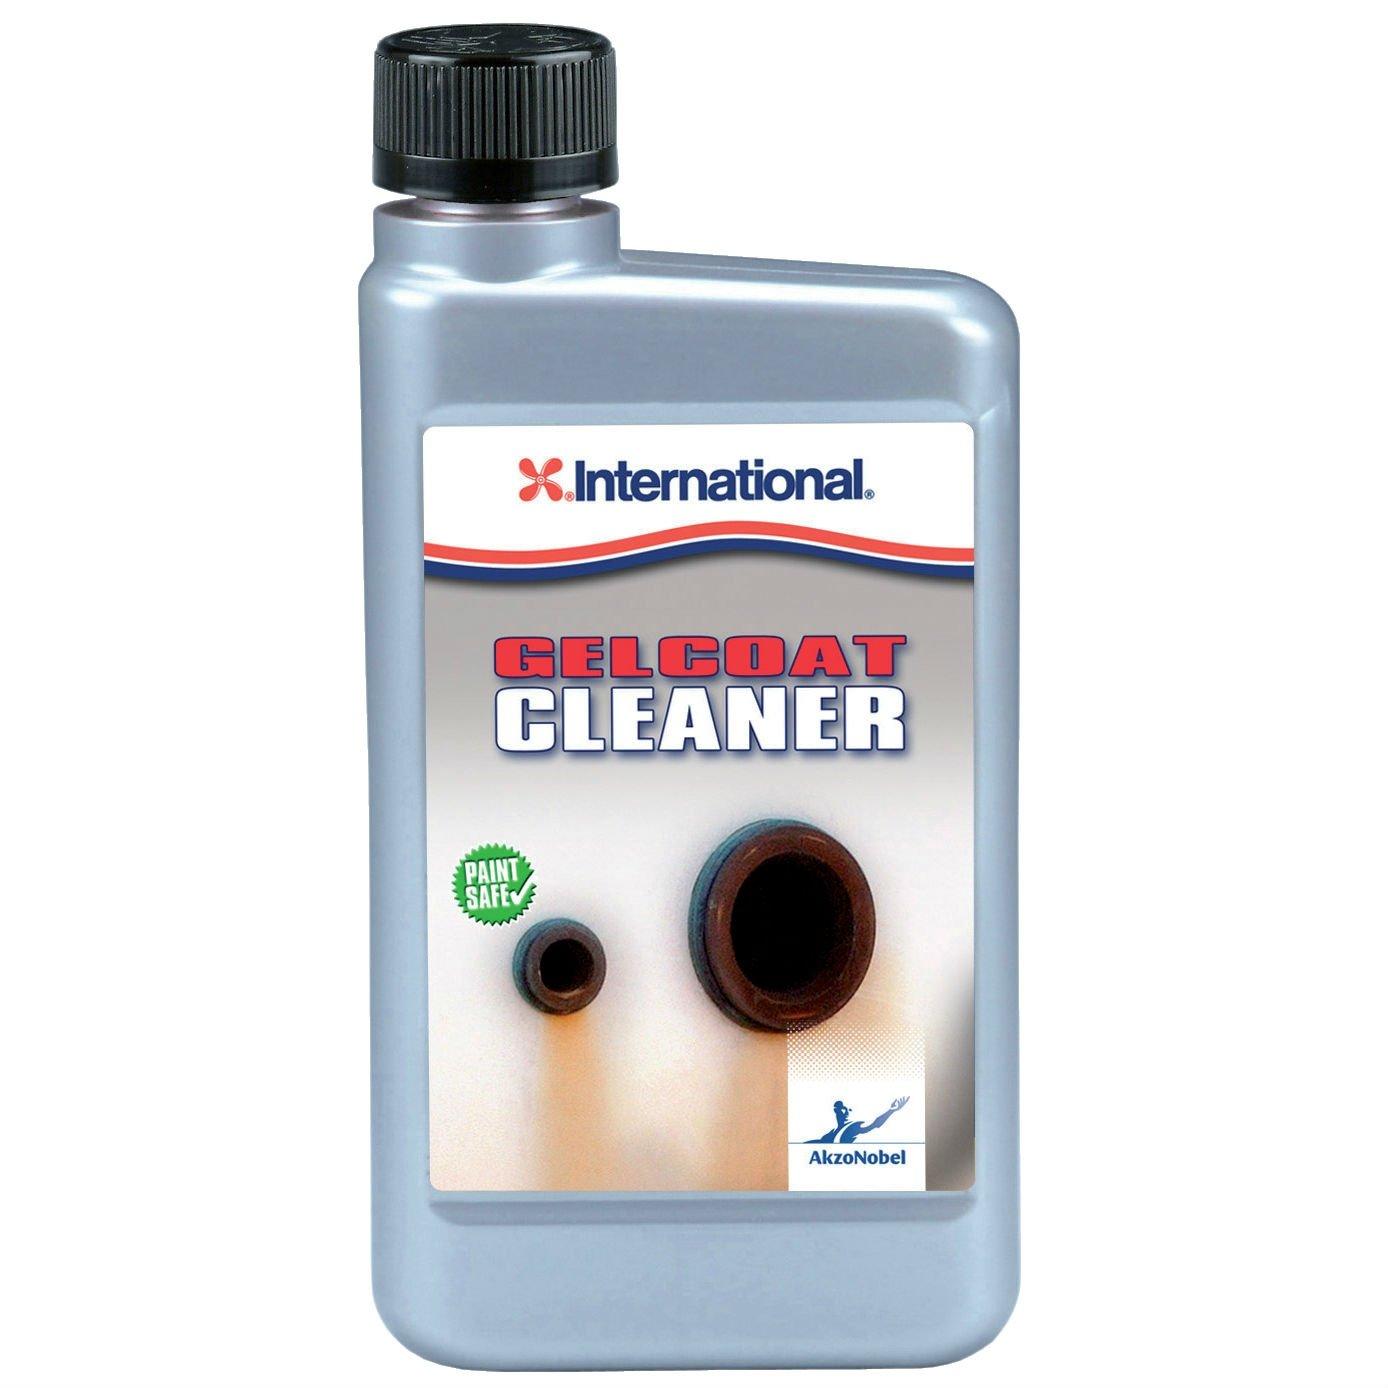 Gelcoat cleaner